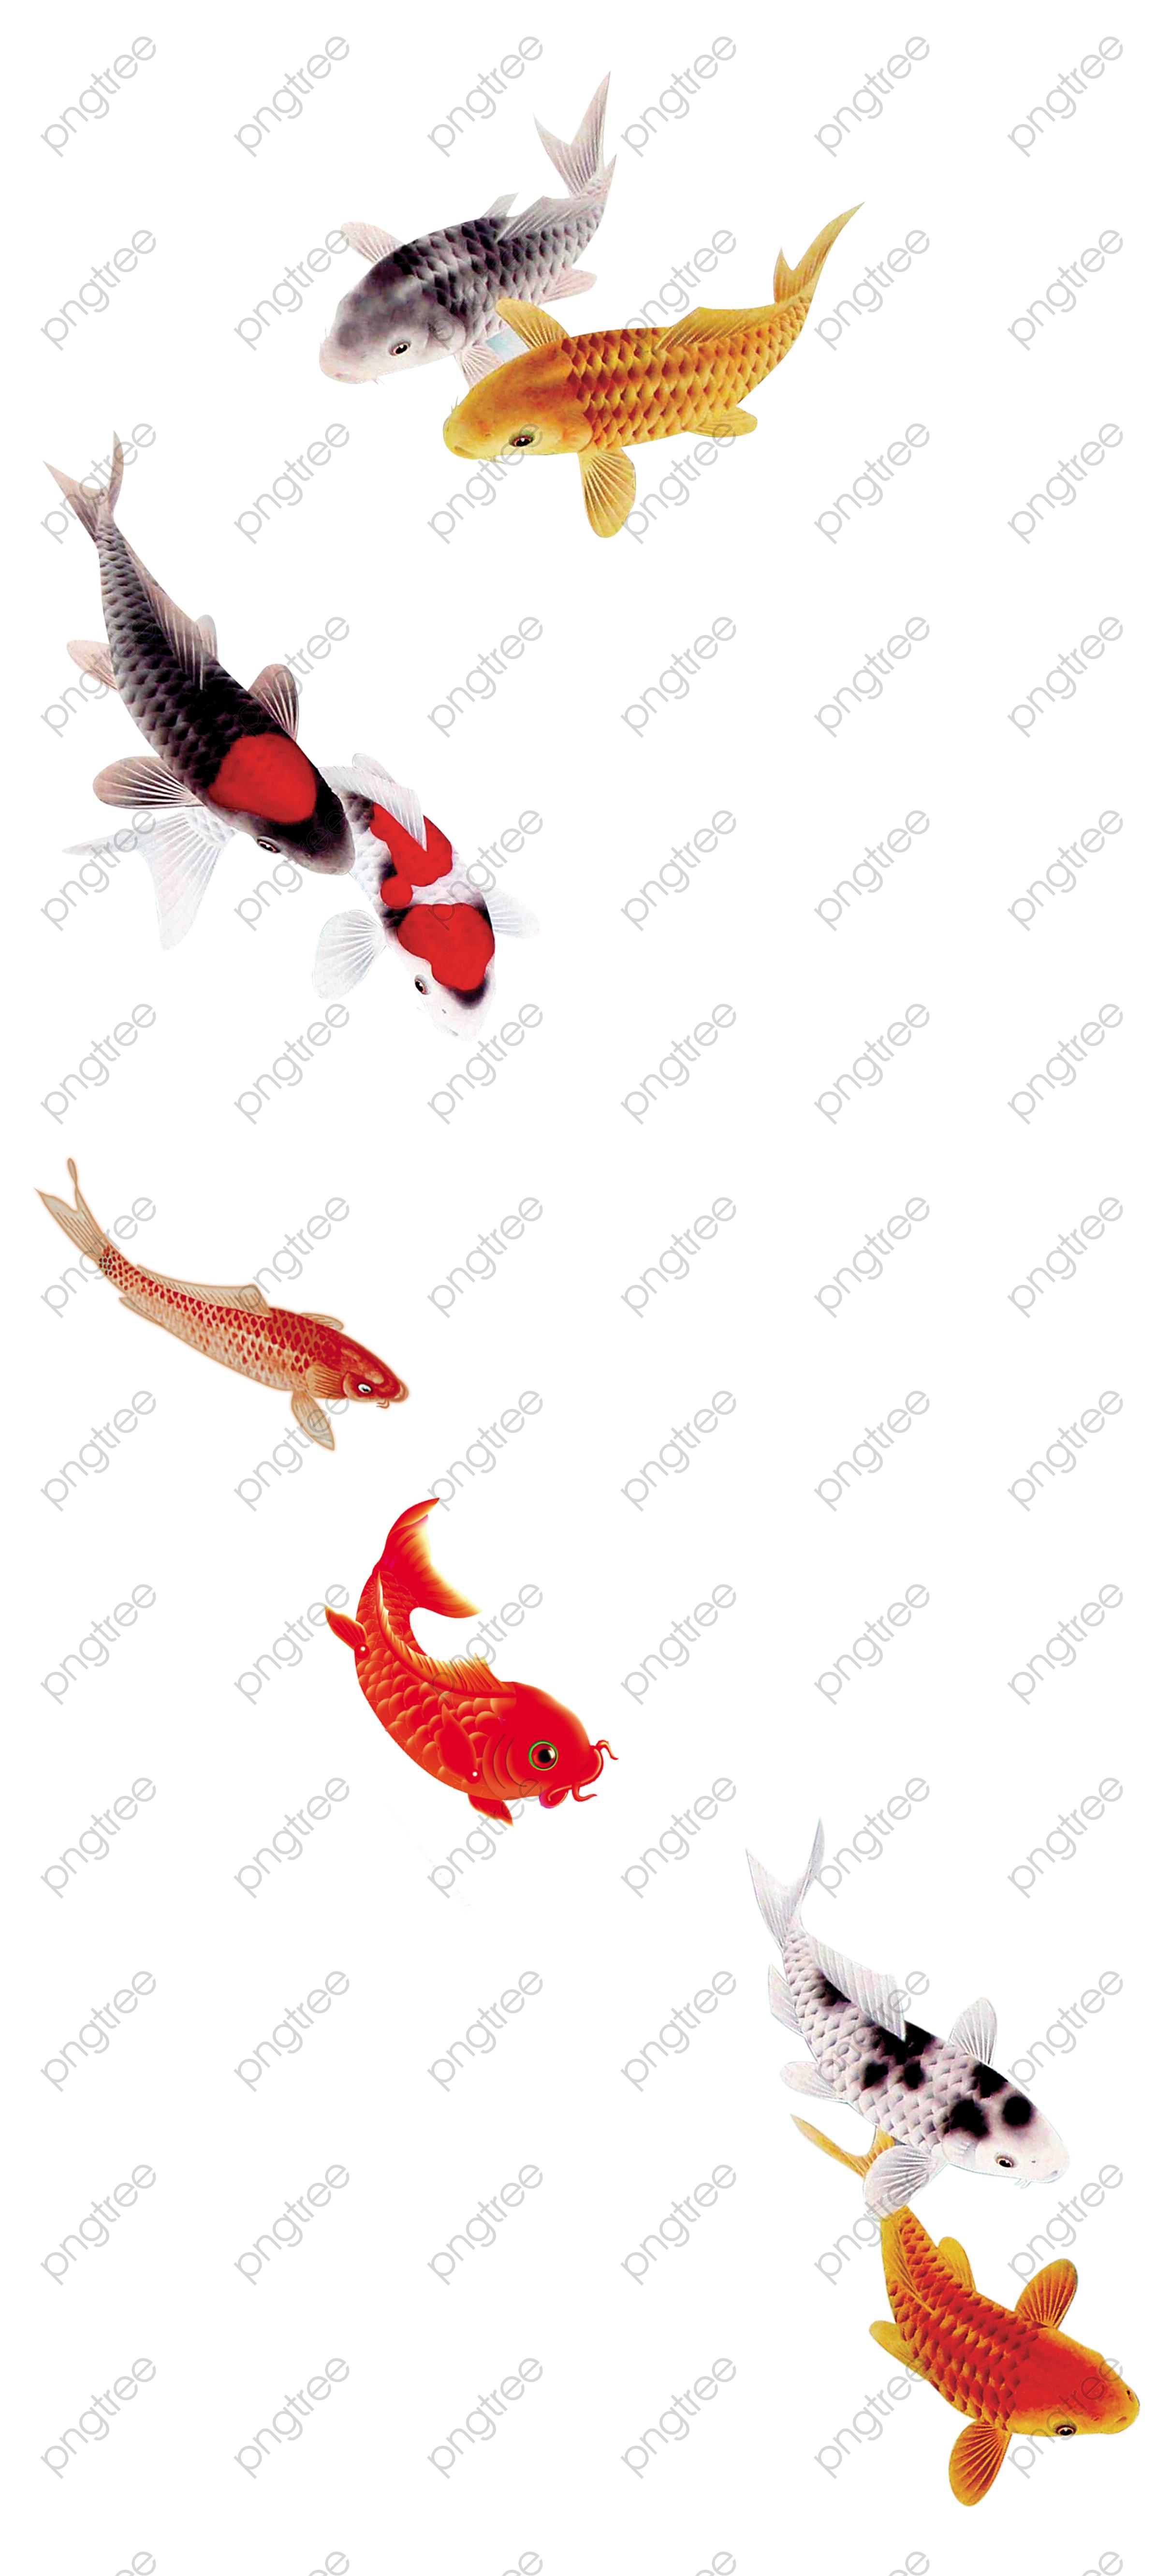 Transparent beautiful koi carp fish goldfish fine PNG Format Image With Size 2422*5326 ...